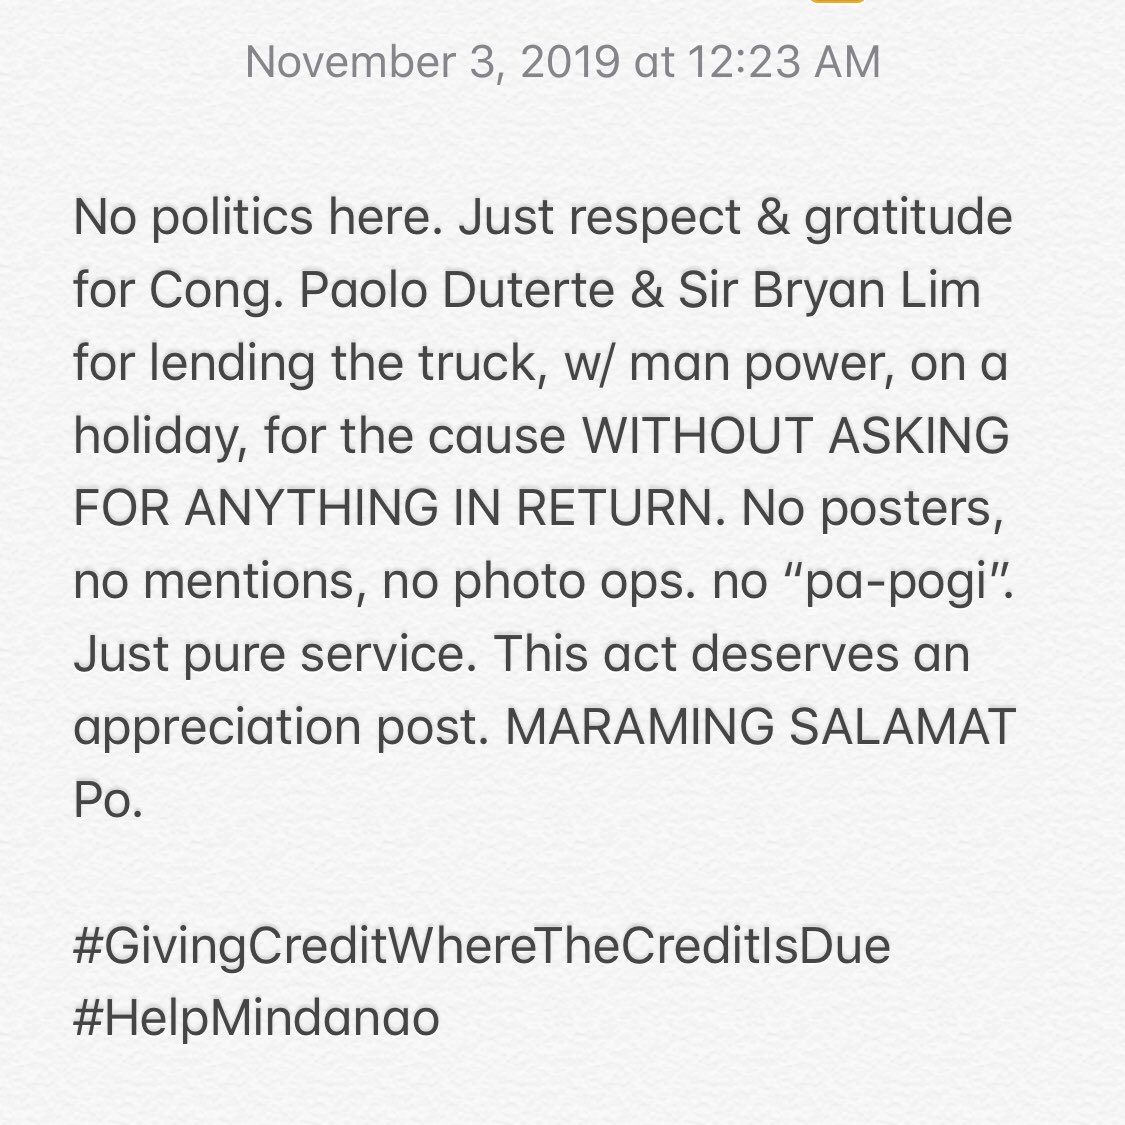 #GivingCreditWhereTheCreditIsDue #HelpMindanao